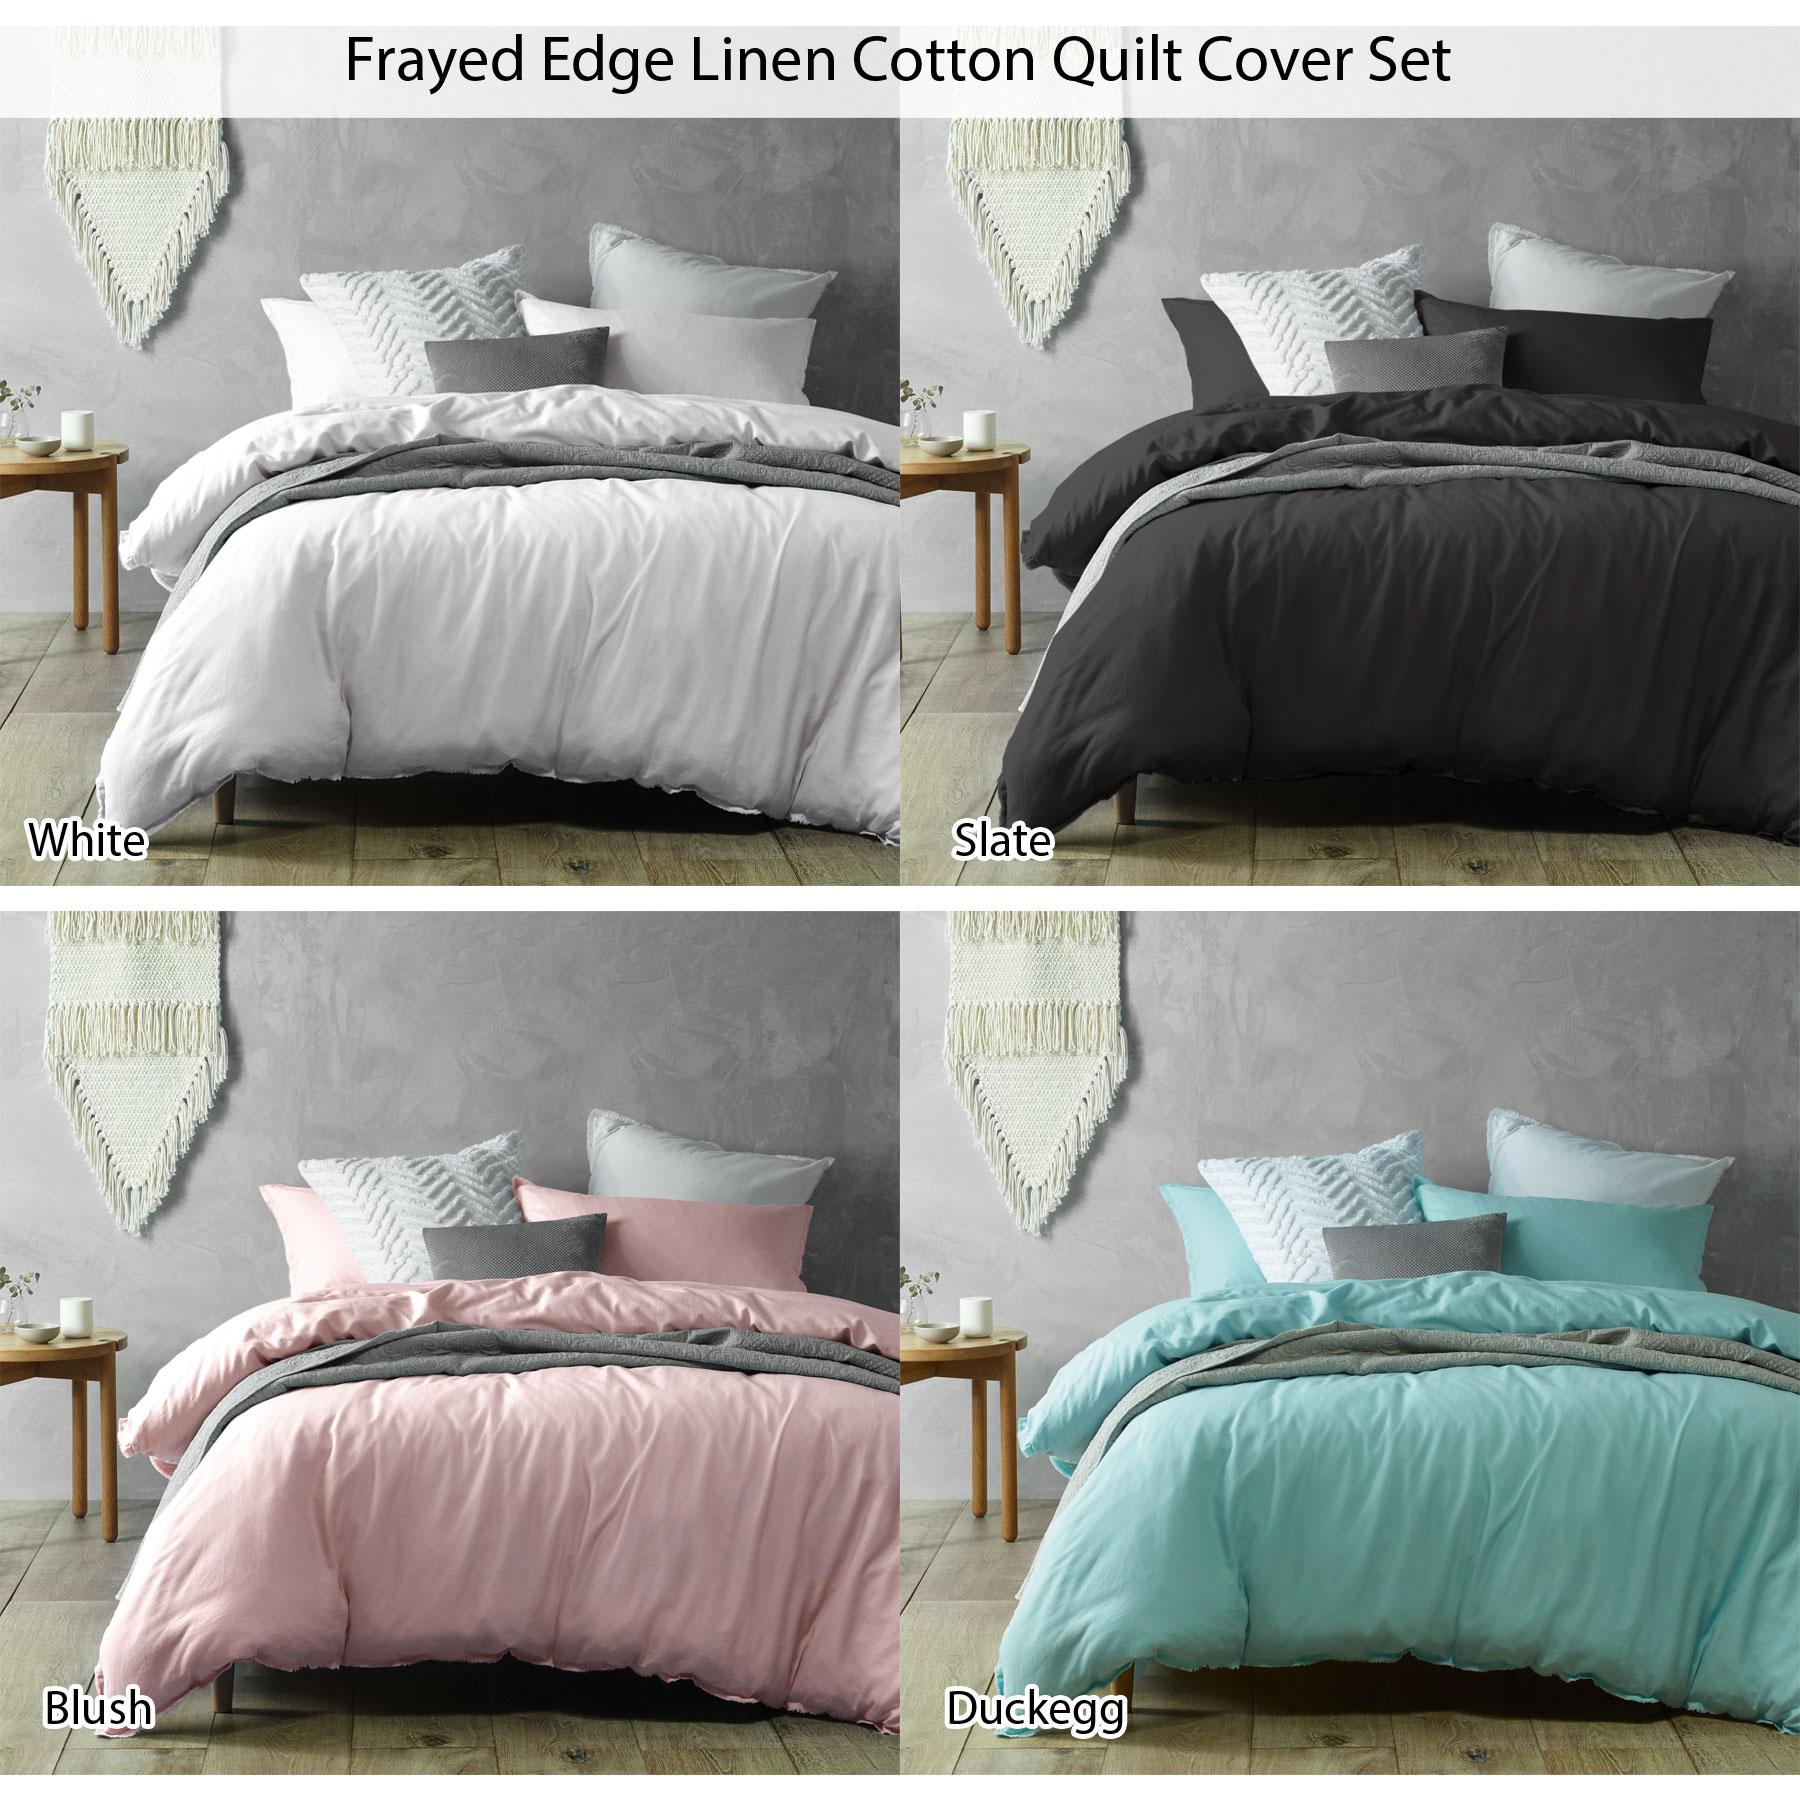 cover bed made dark square blush viola duvet sateen com uk set stonewashed cotton